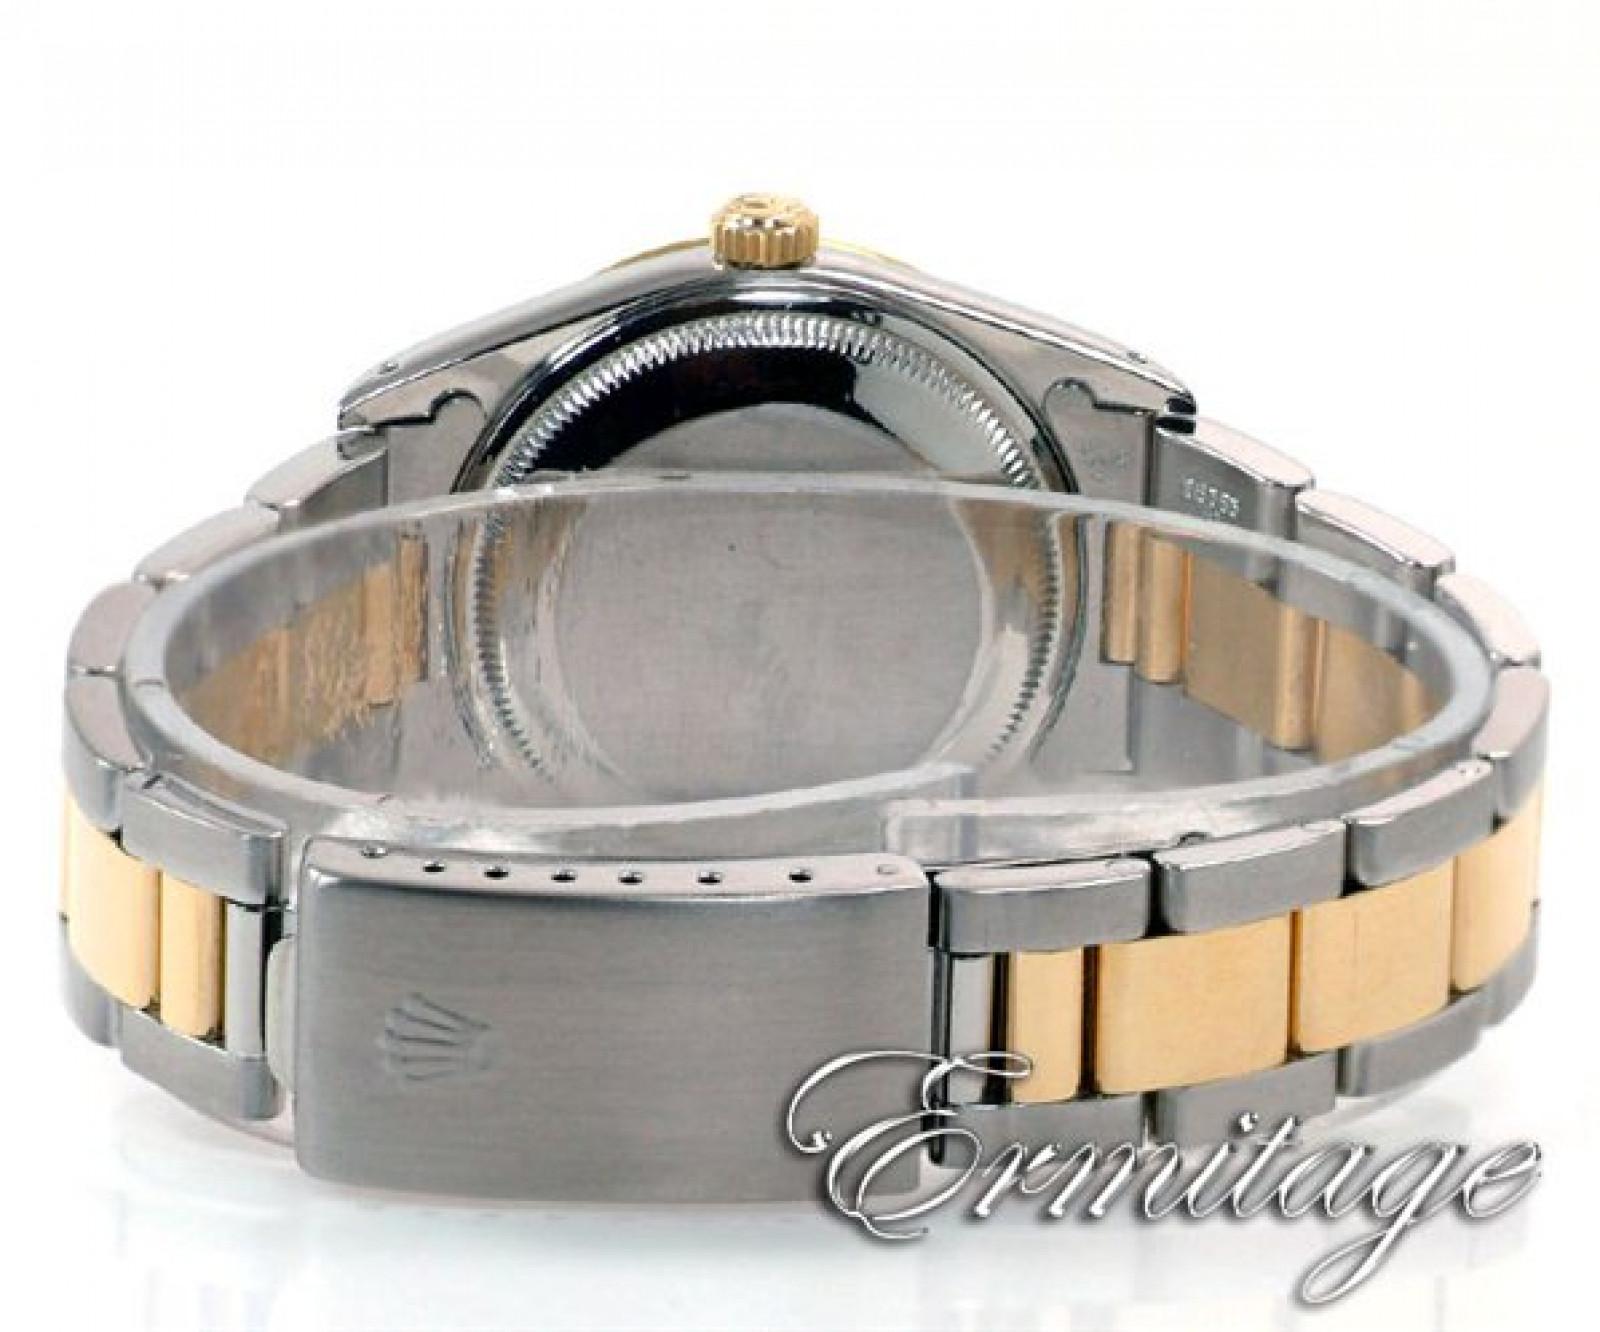 Rolex Date 15053 Gold & Steel Champagne 1990